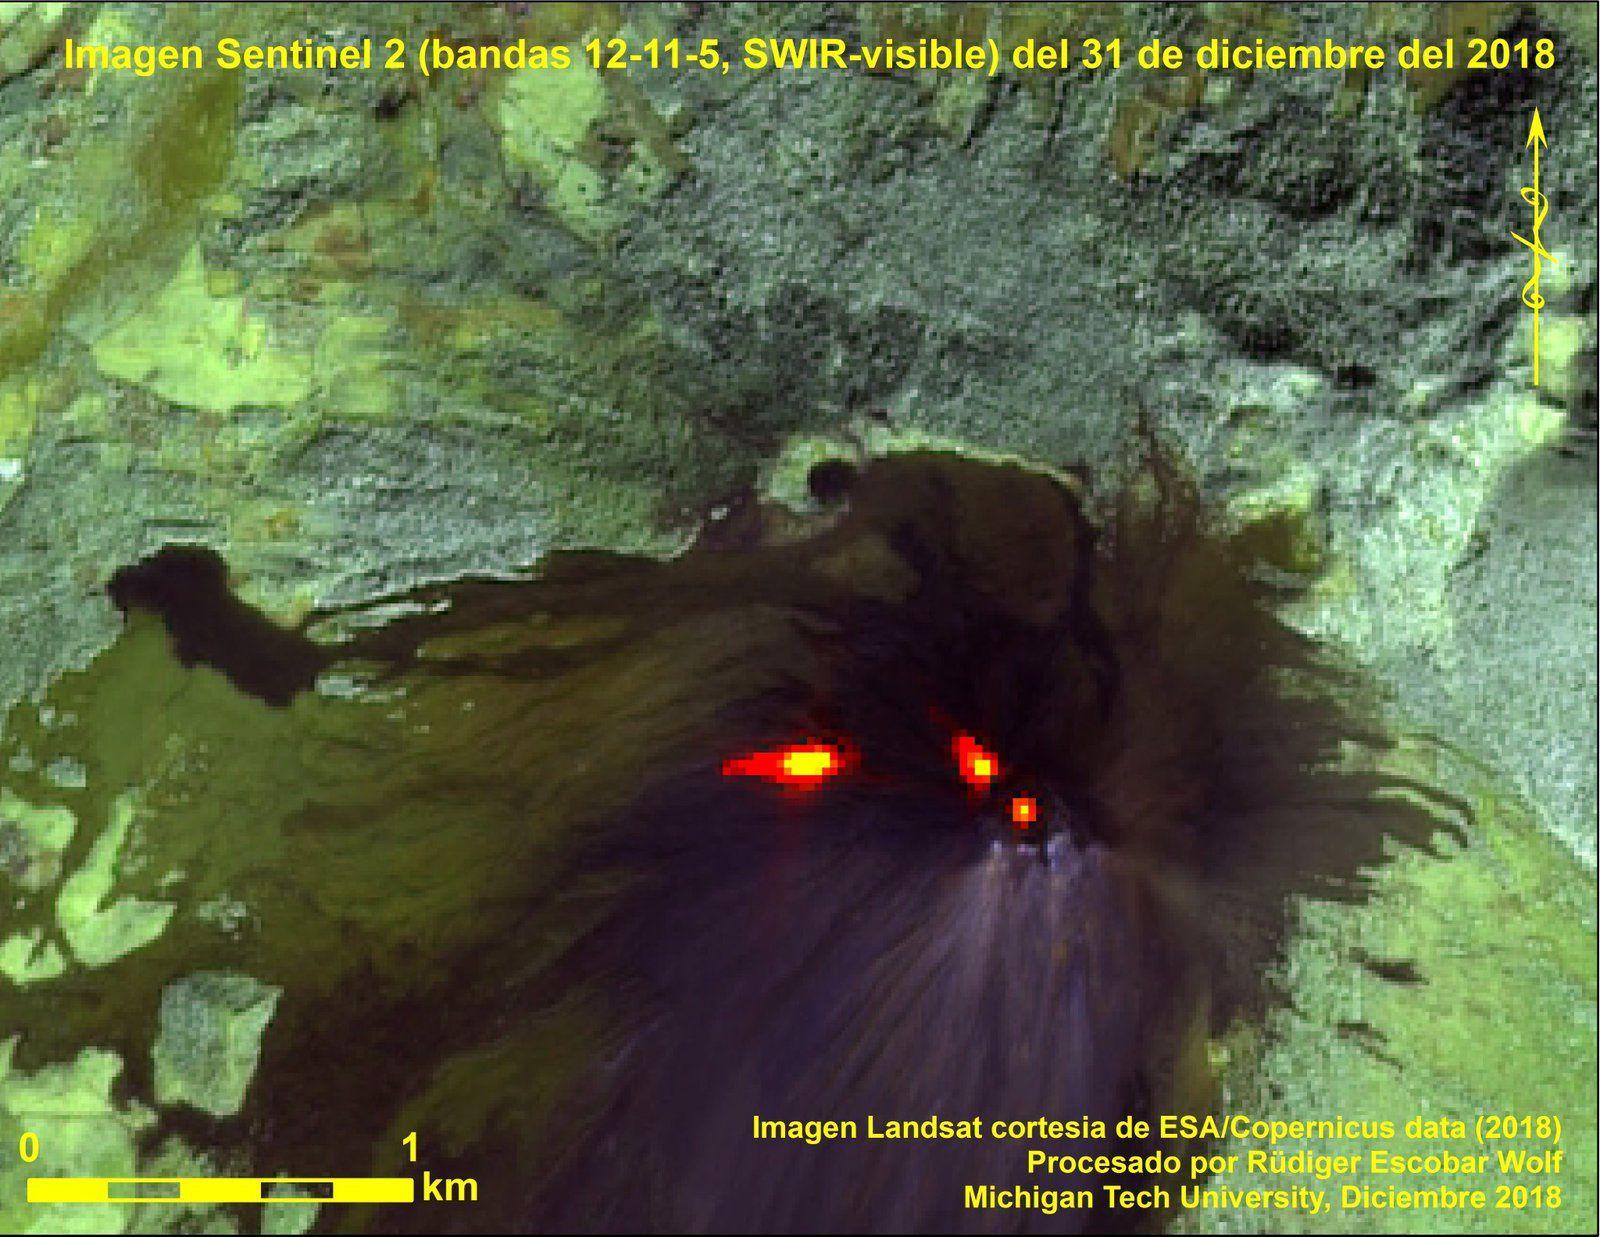 Pacaya - image Sentinel 2 bands 12,11,5, SWIR-Visible  par  R.E.Wolf  MTU / 31.12.2018